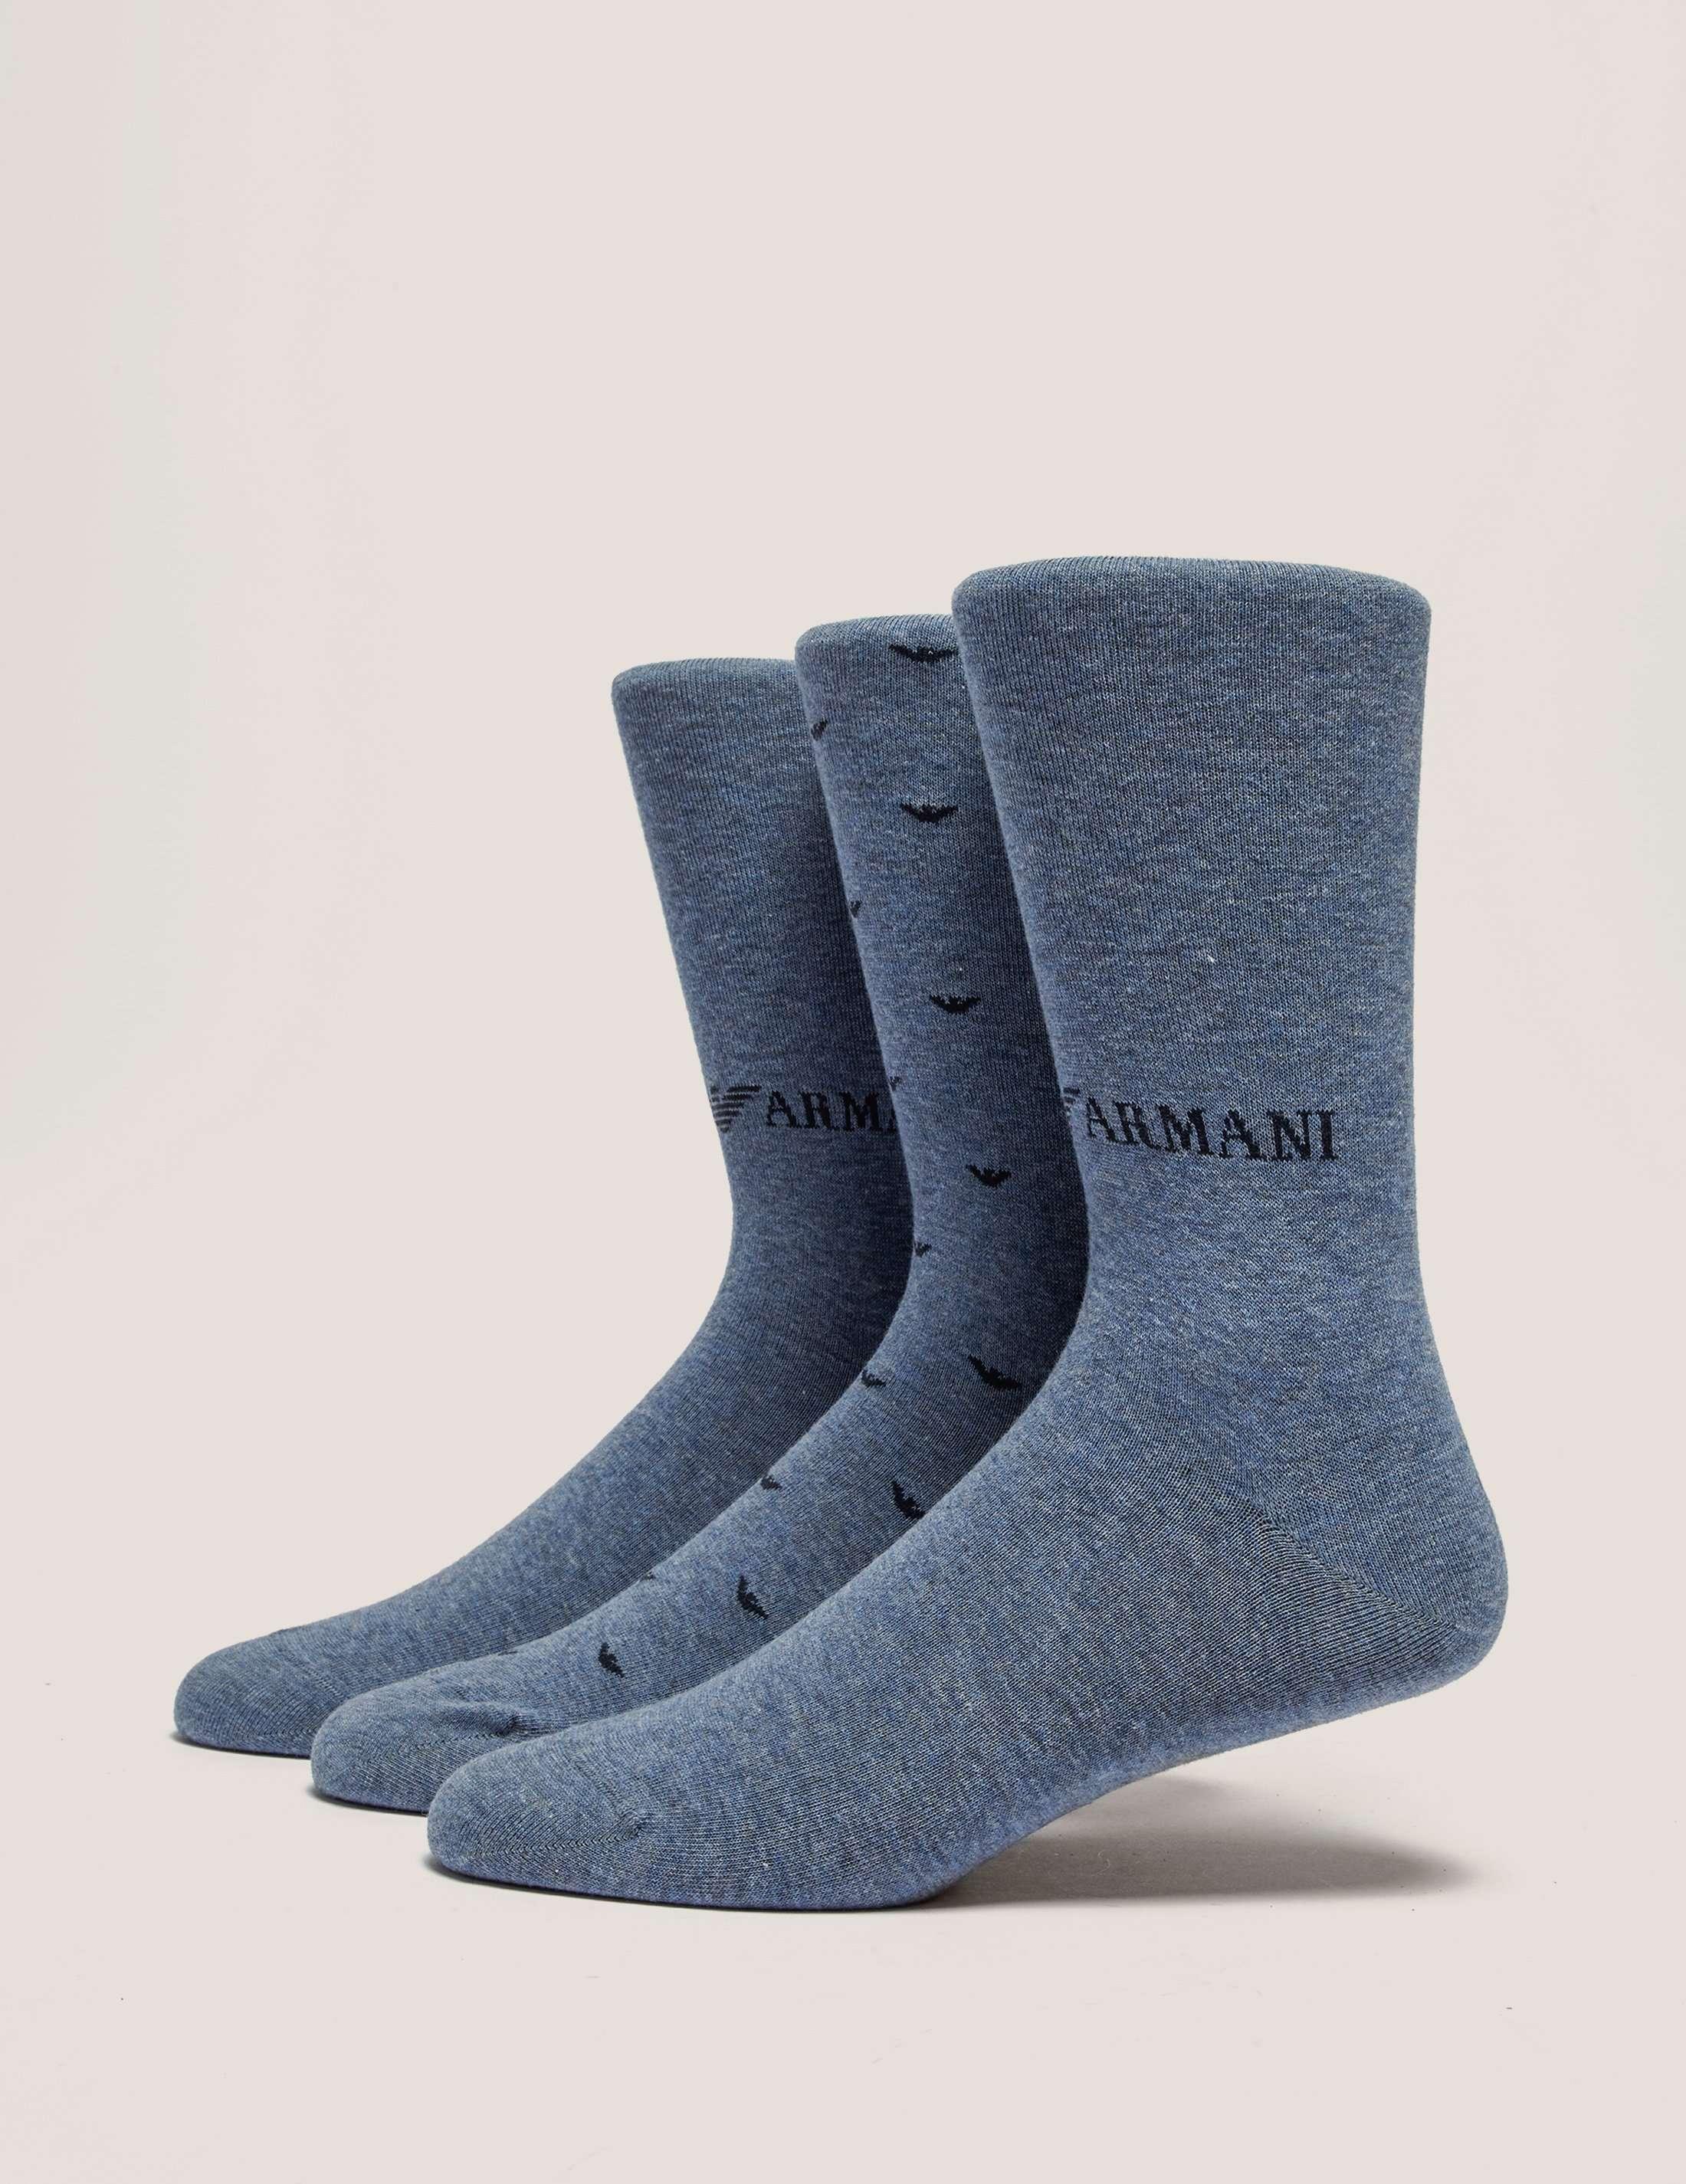 Emporio Armani Short Socks